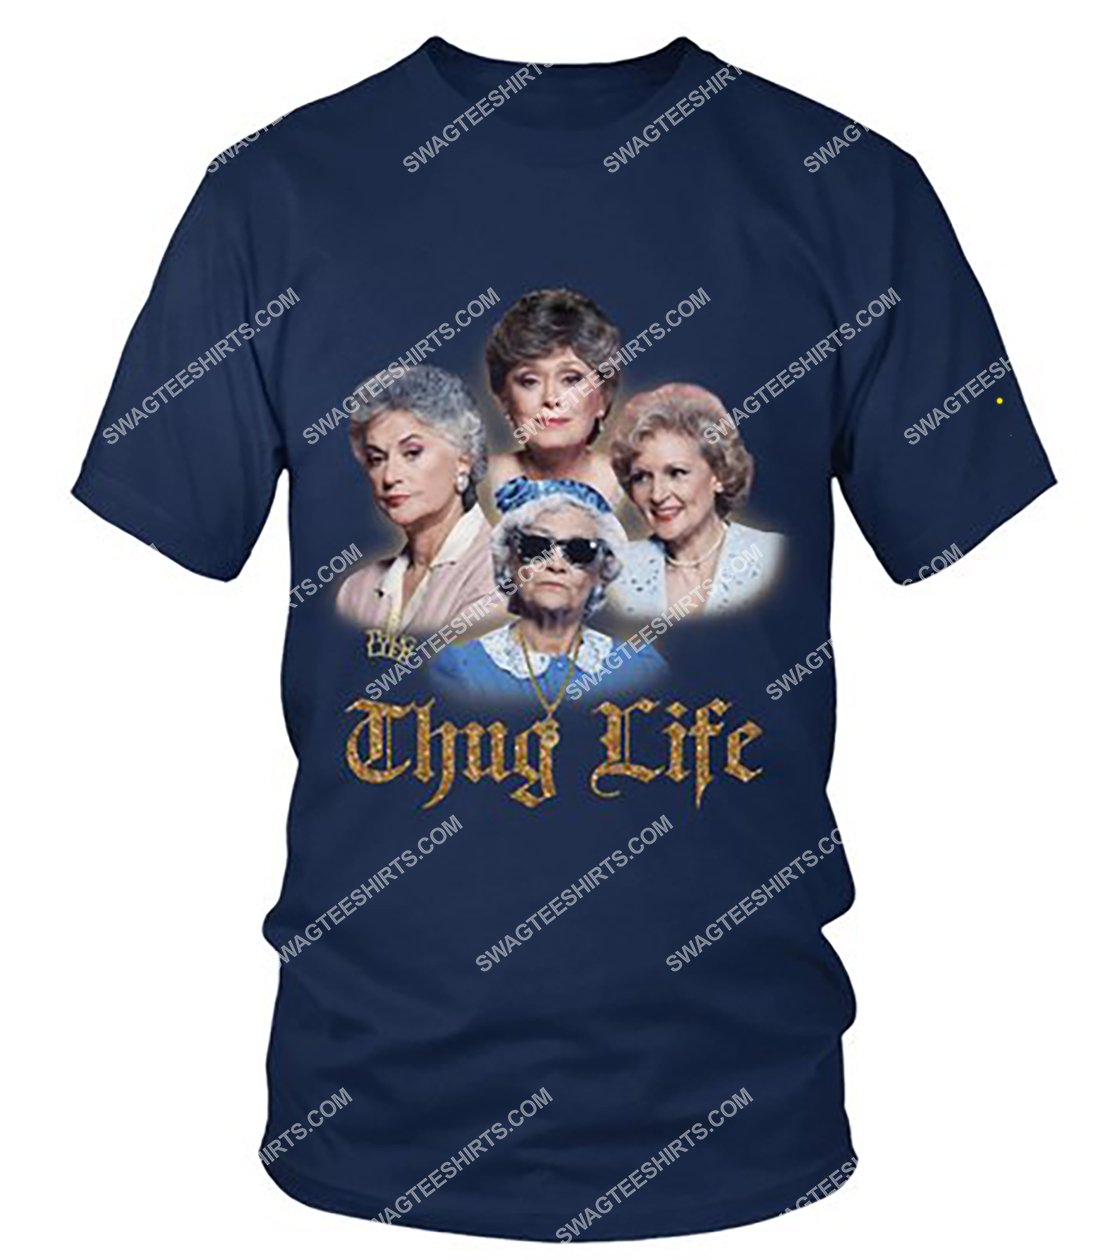 thug life the golden girls movie shirt 4(1)